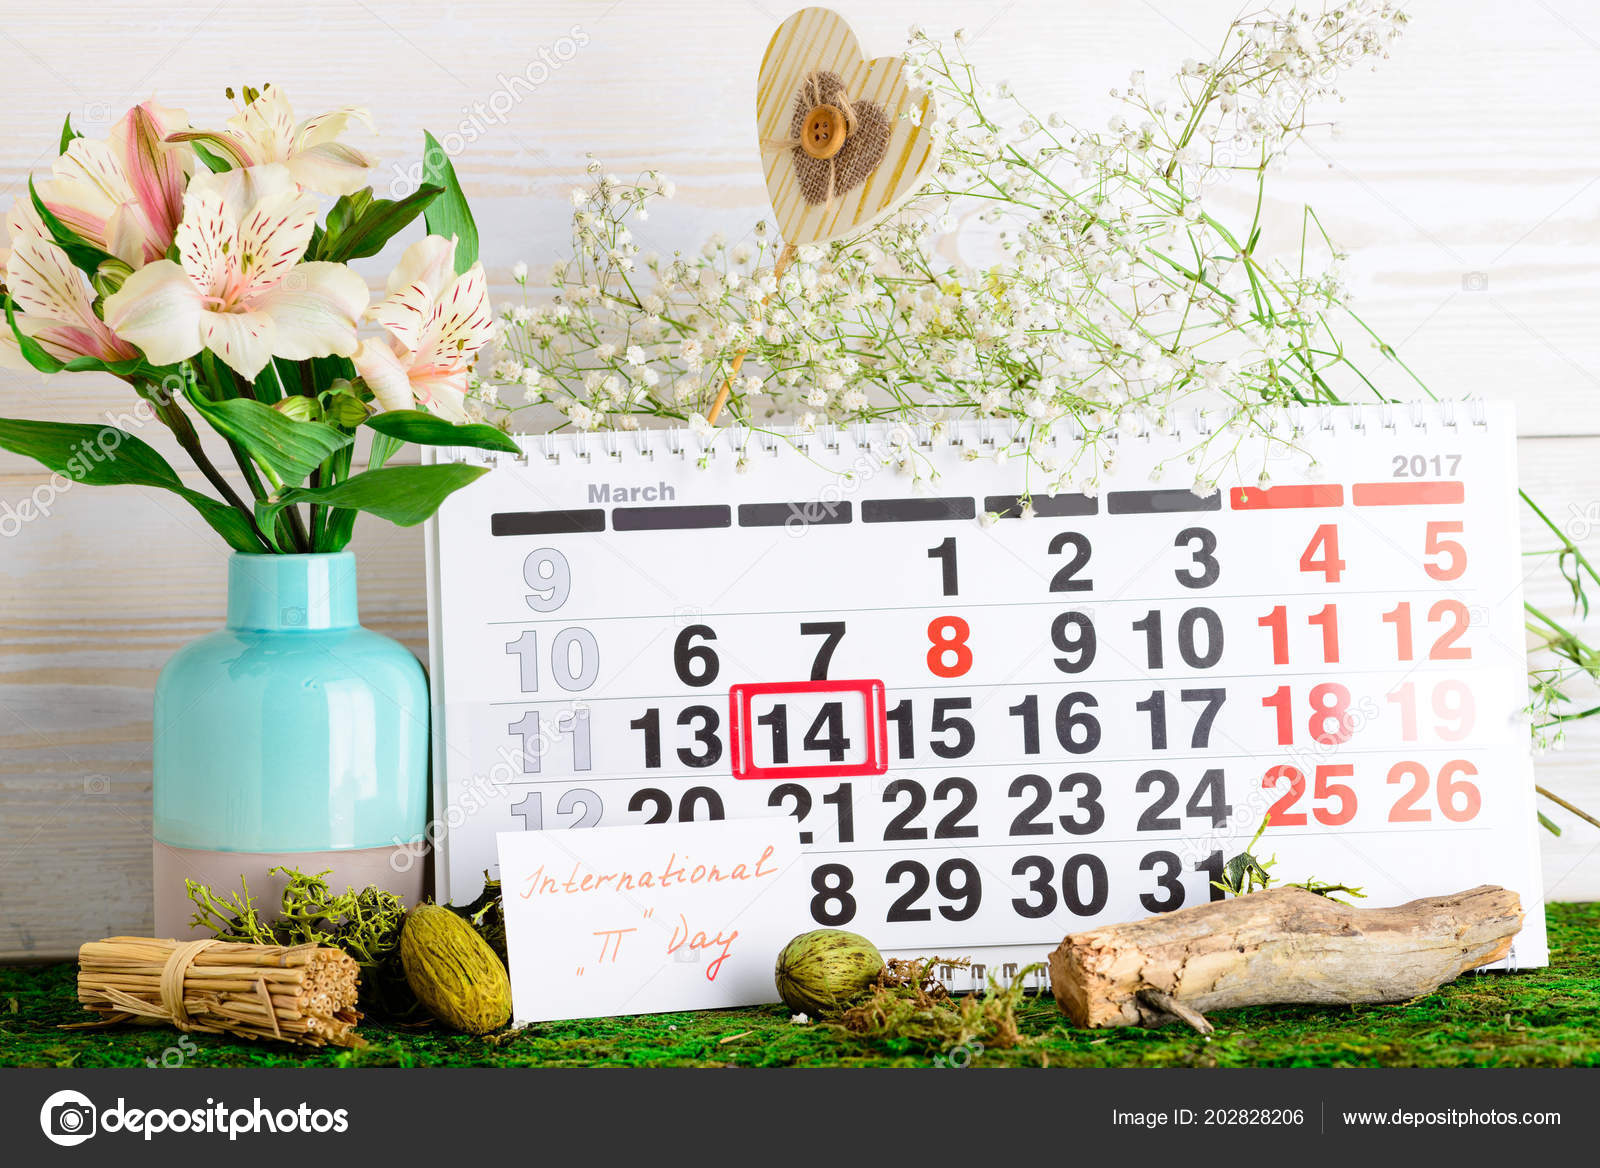 March 14, international day of Pi on calendar — Stock Photo